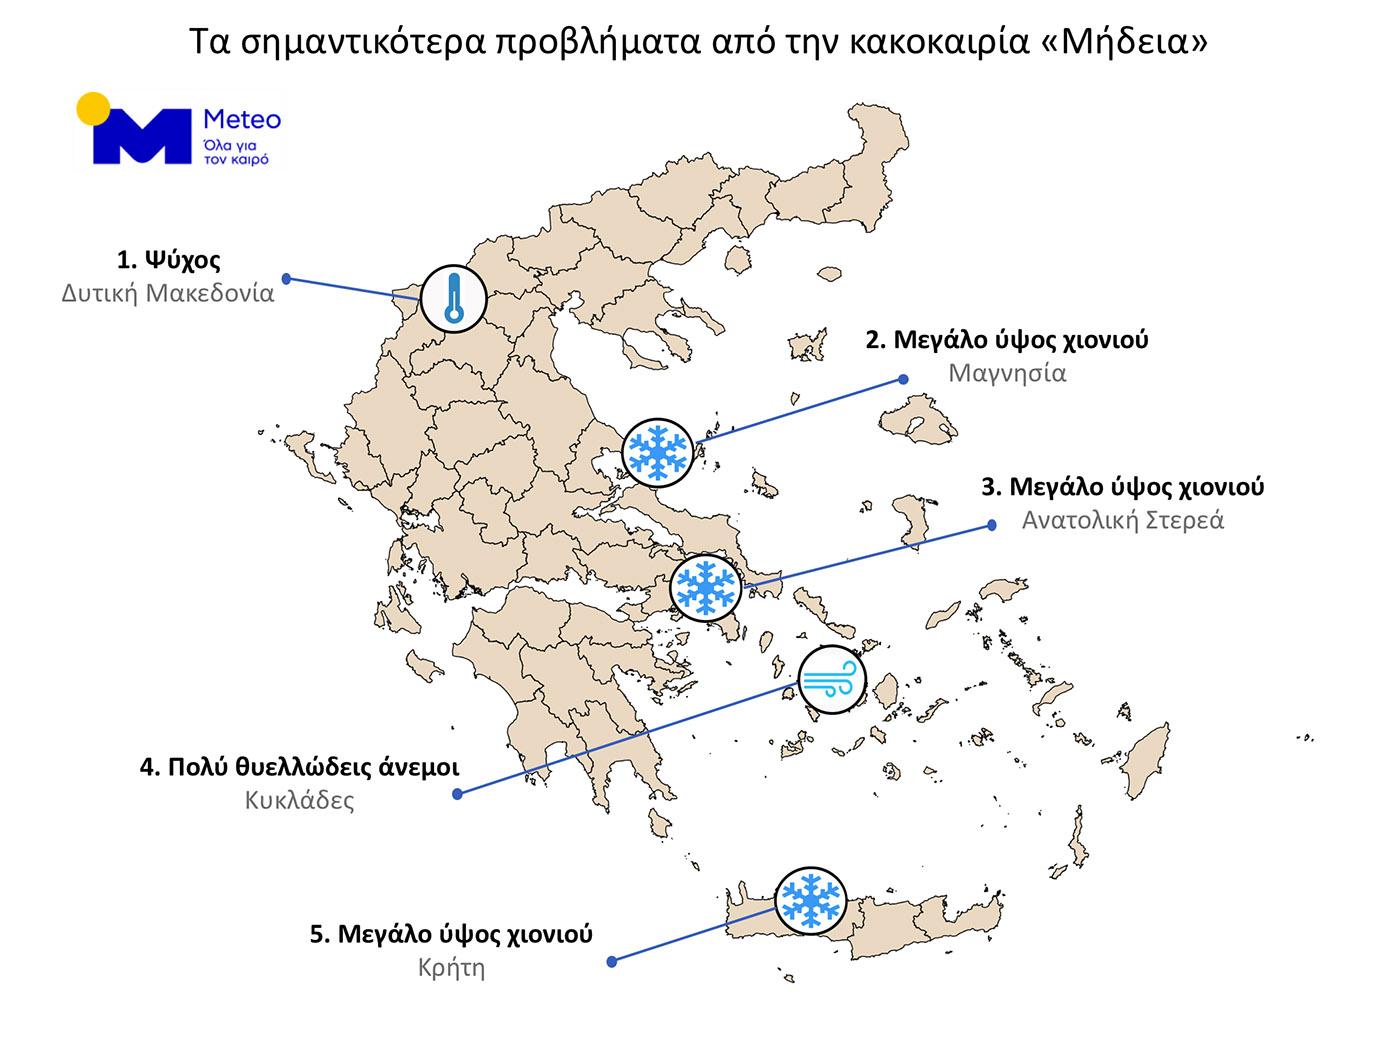 https://meteo.gr/UploadedFiles/articlePhotos/FEB21/Mideia_problems.jpg